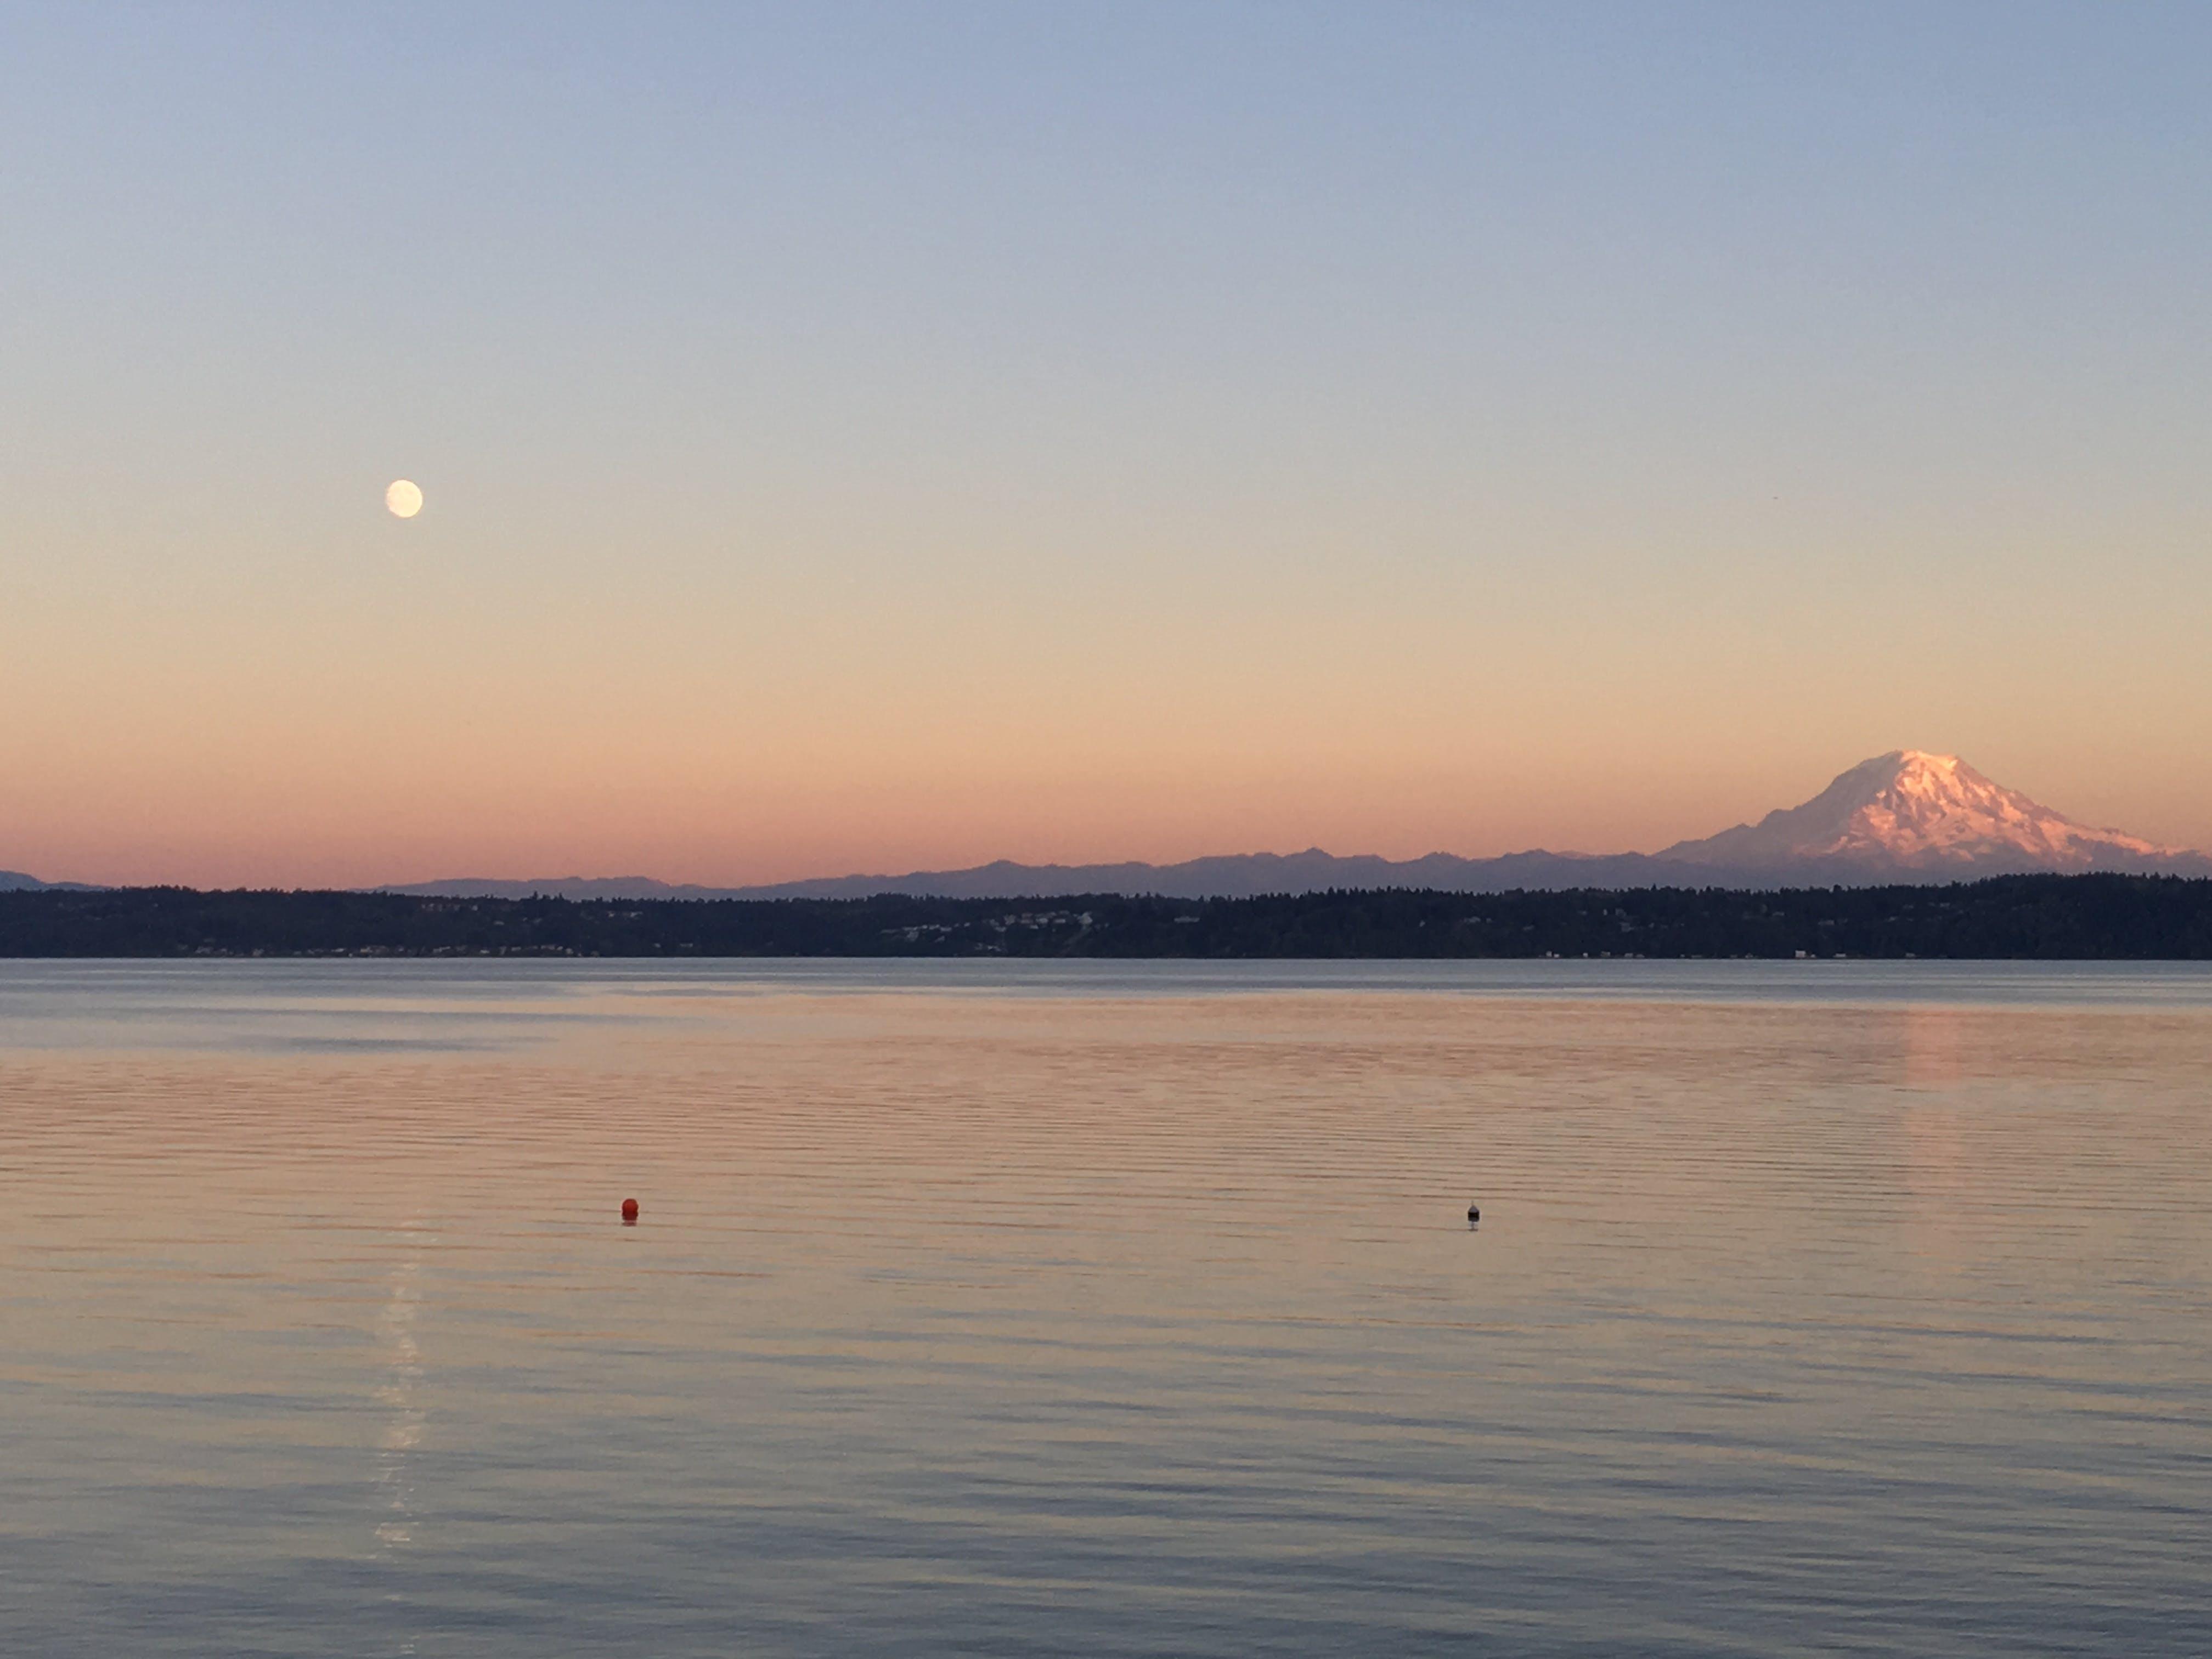 Free stock photo of moon, Mount Rainer, mountain, ocean